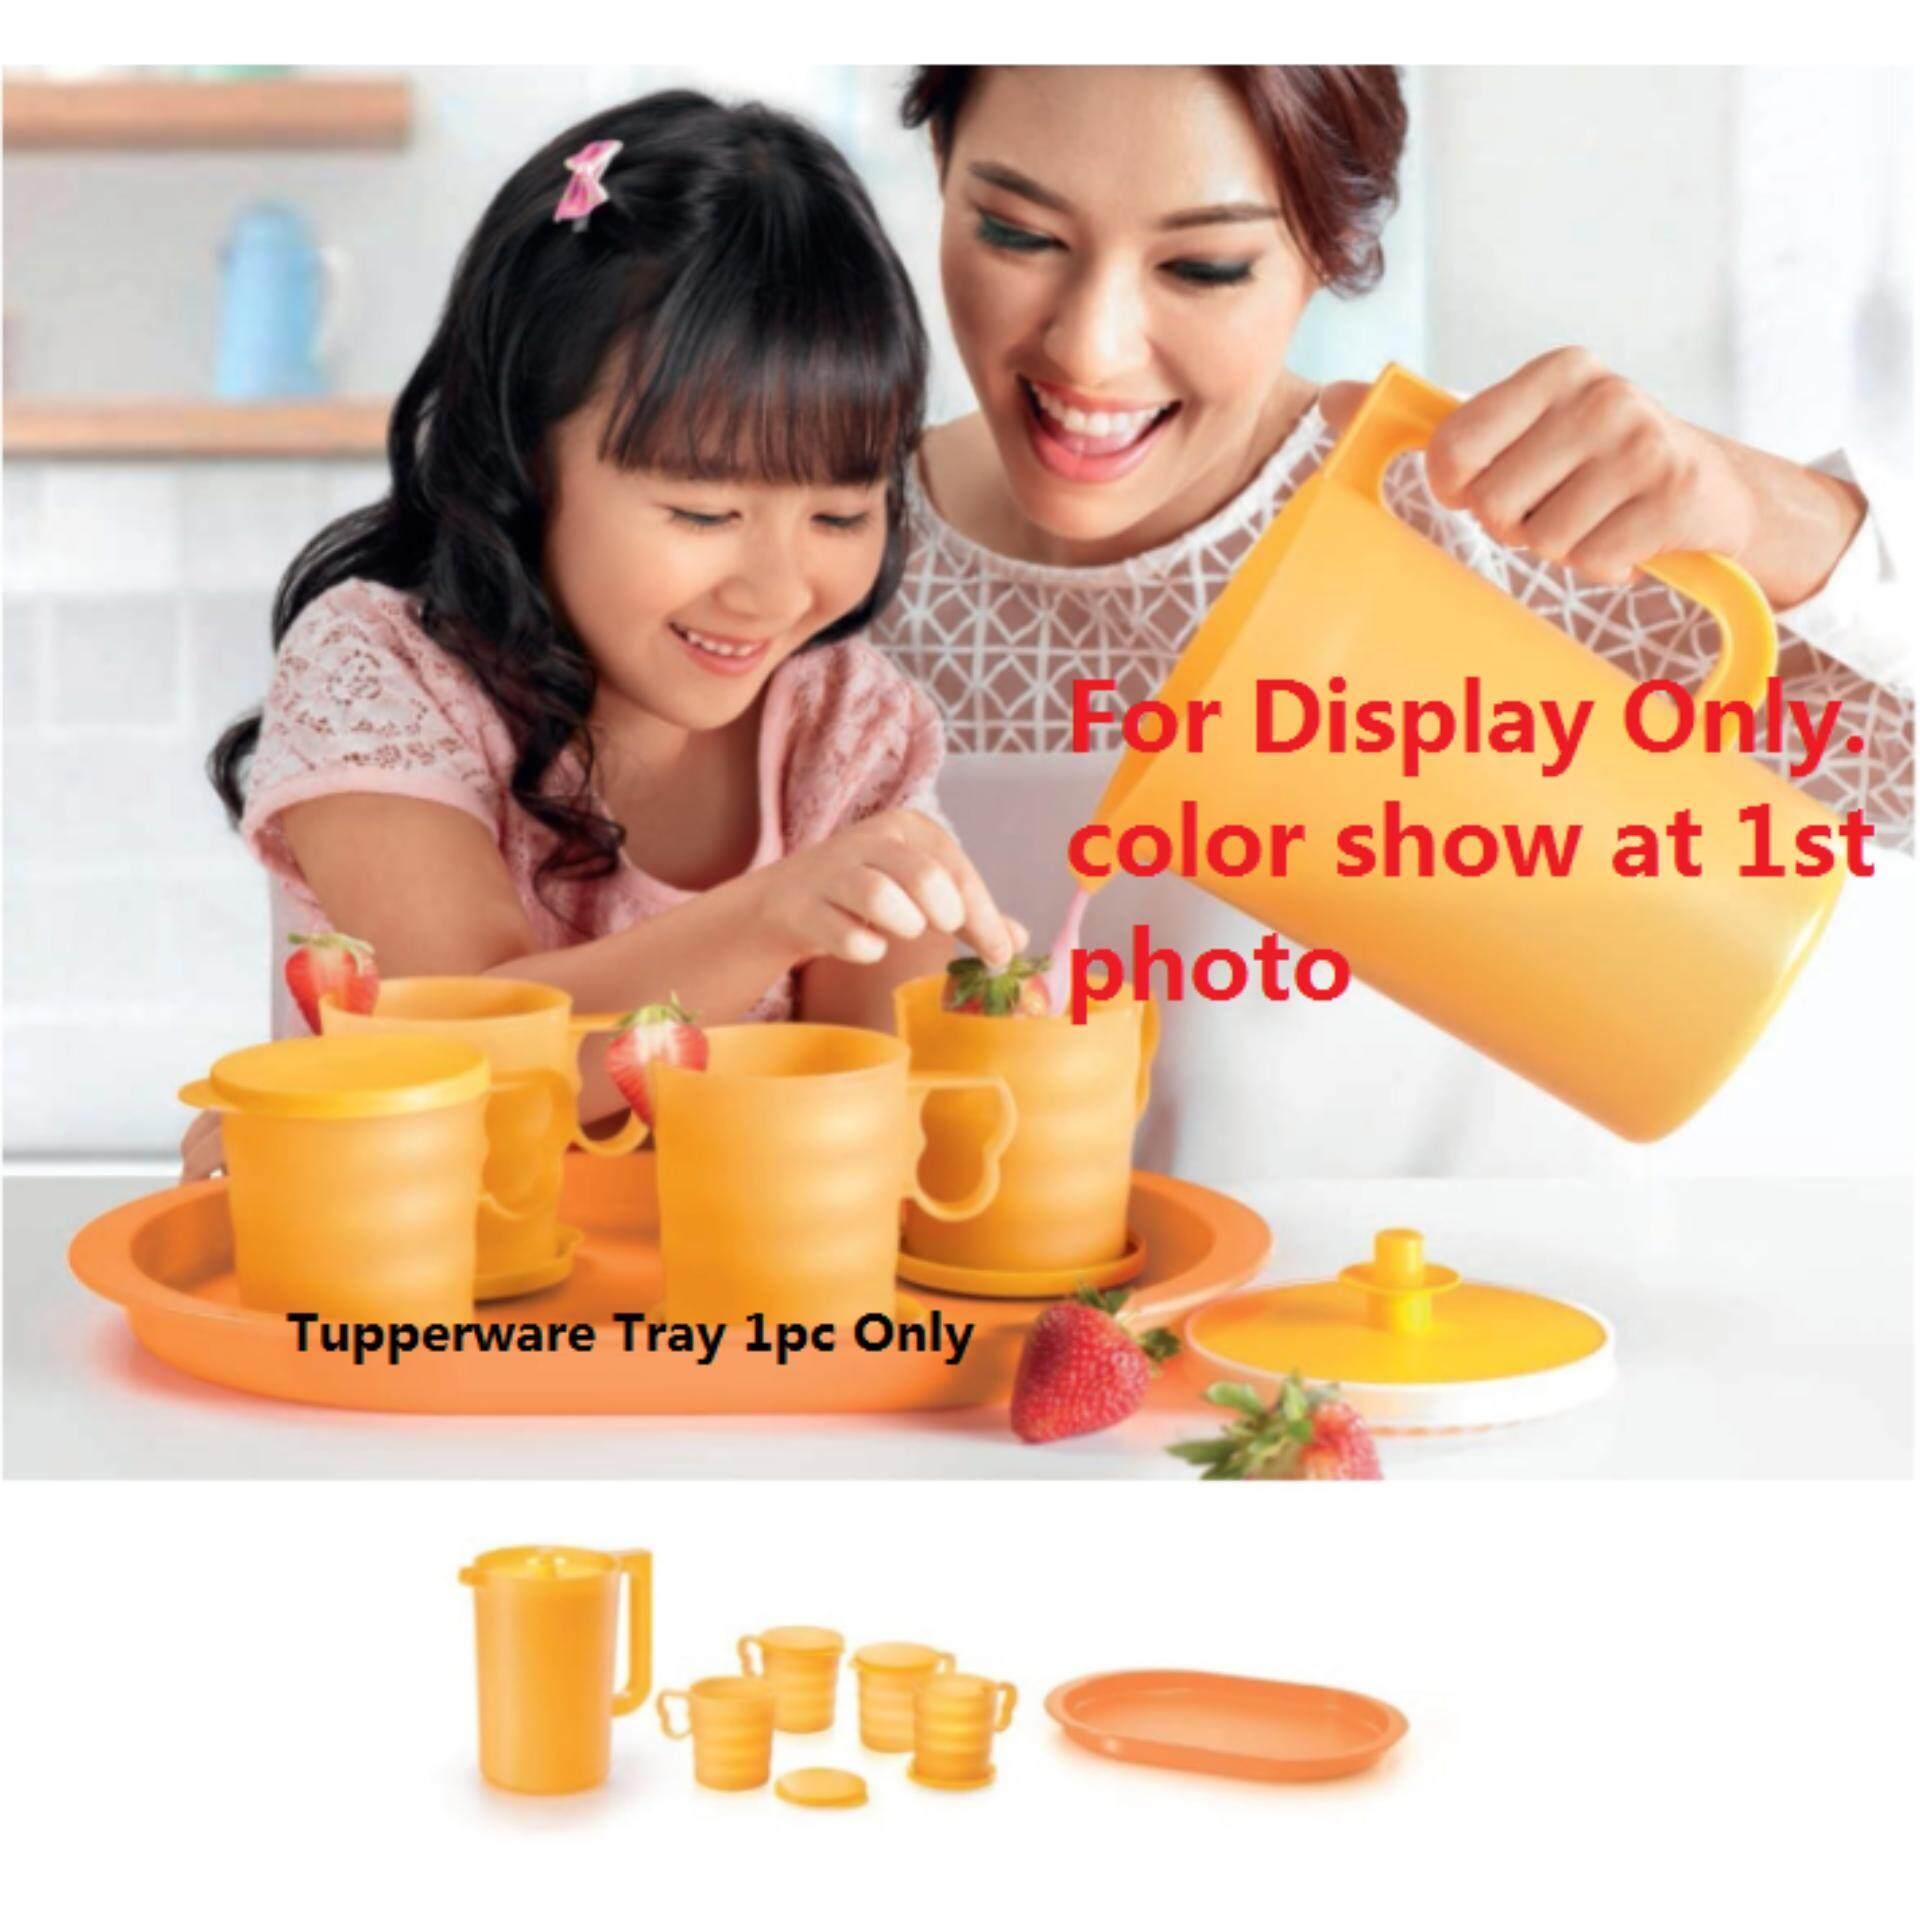 Tupperware Serving Tray (1) Light Orange